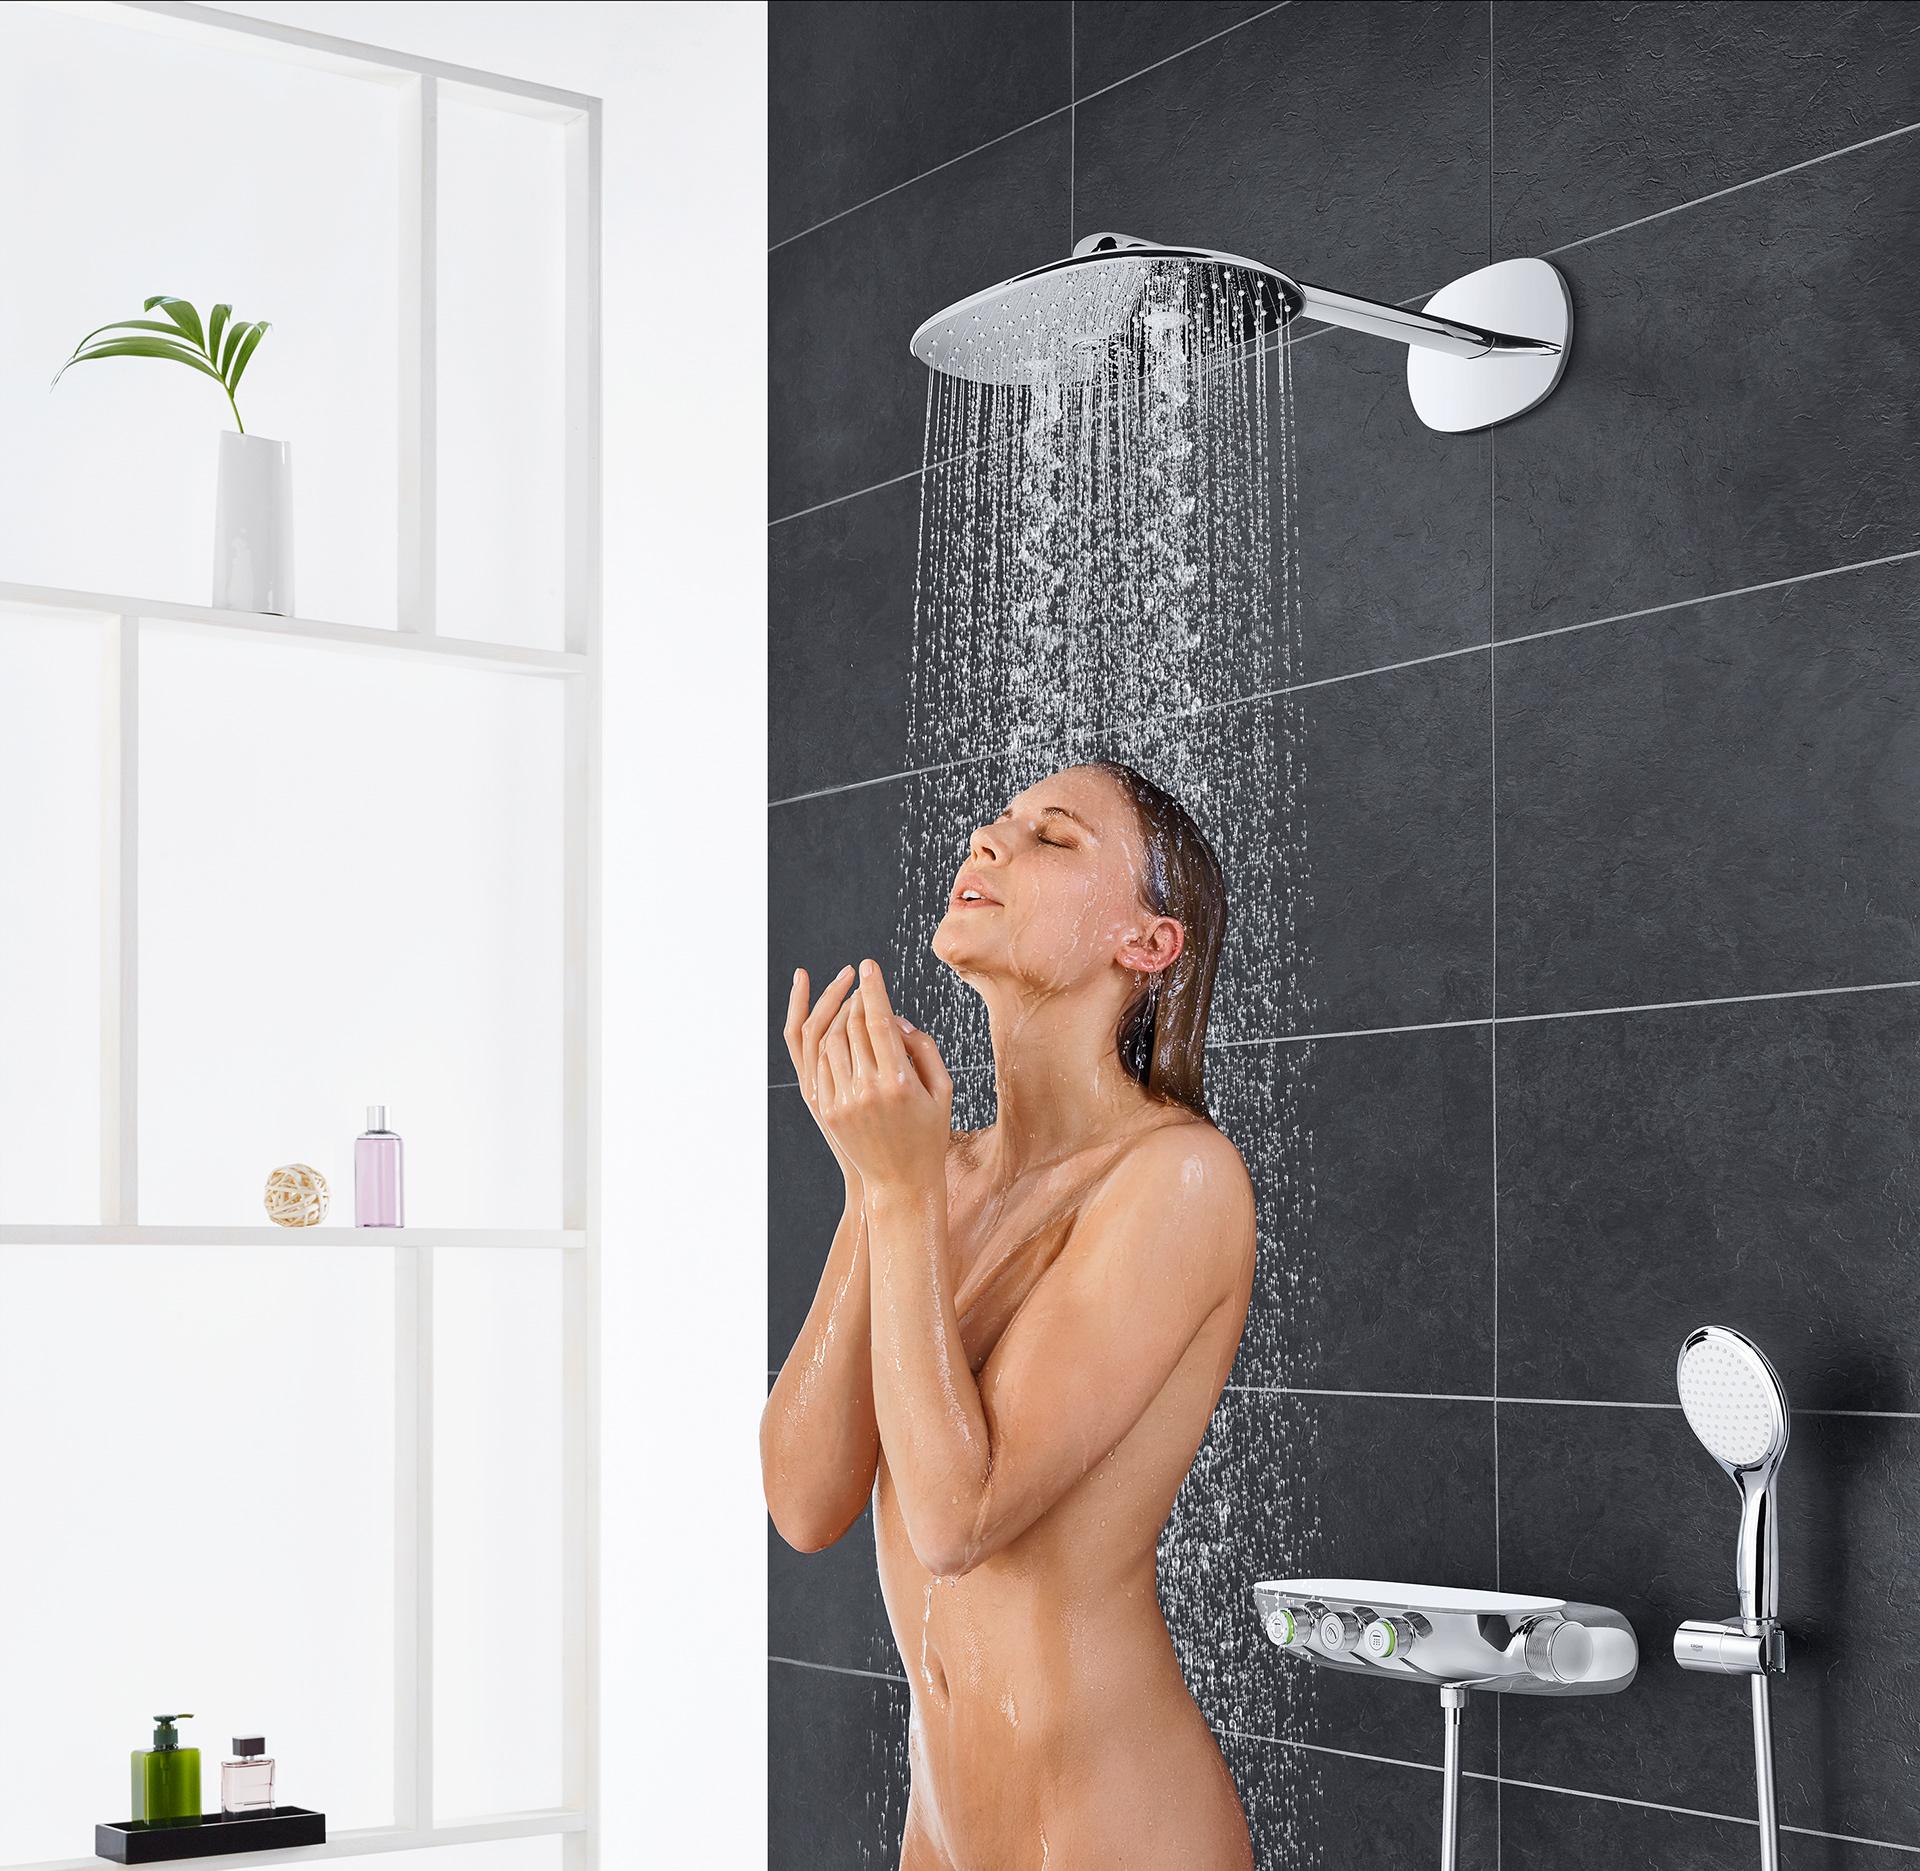 Ritual del bañarse